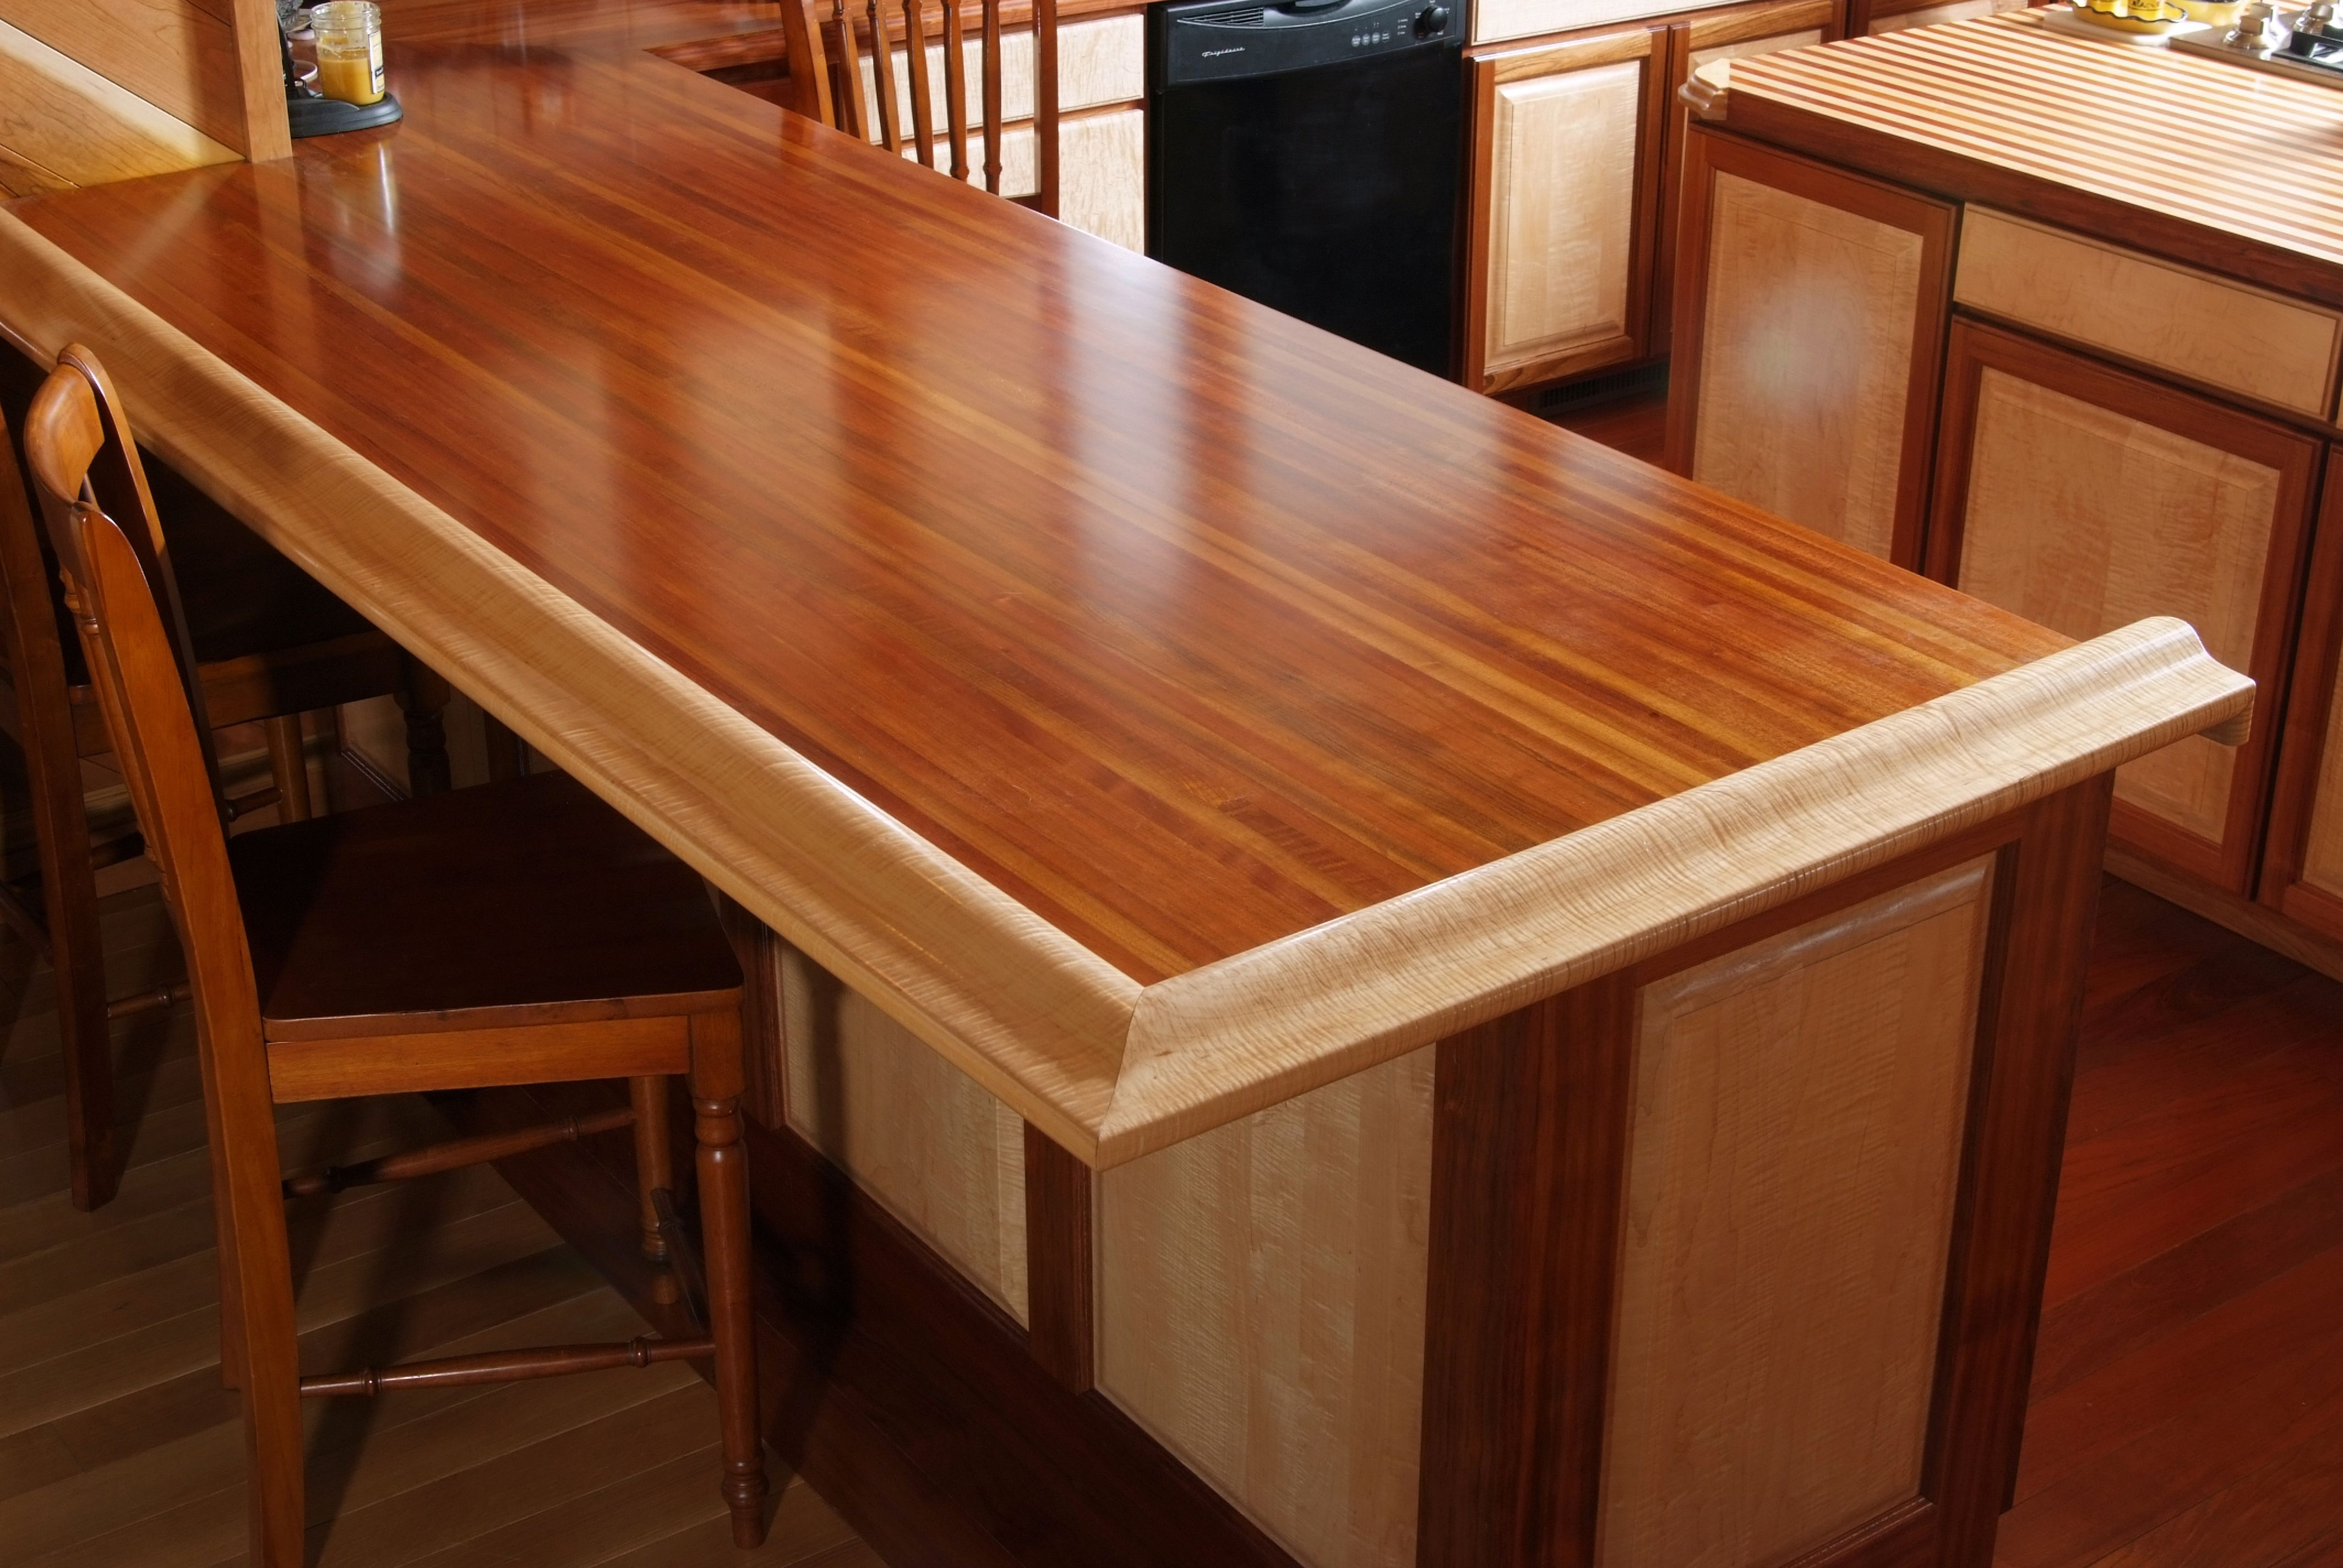 Pin By Baird Brothers Fine Hardwoods On Hardwood Mouldings Hardwood Countertops Brazilian Cherry Maple Bars